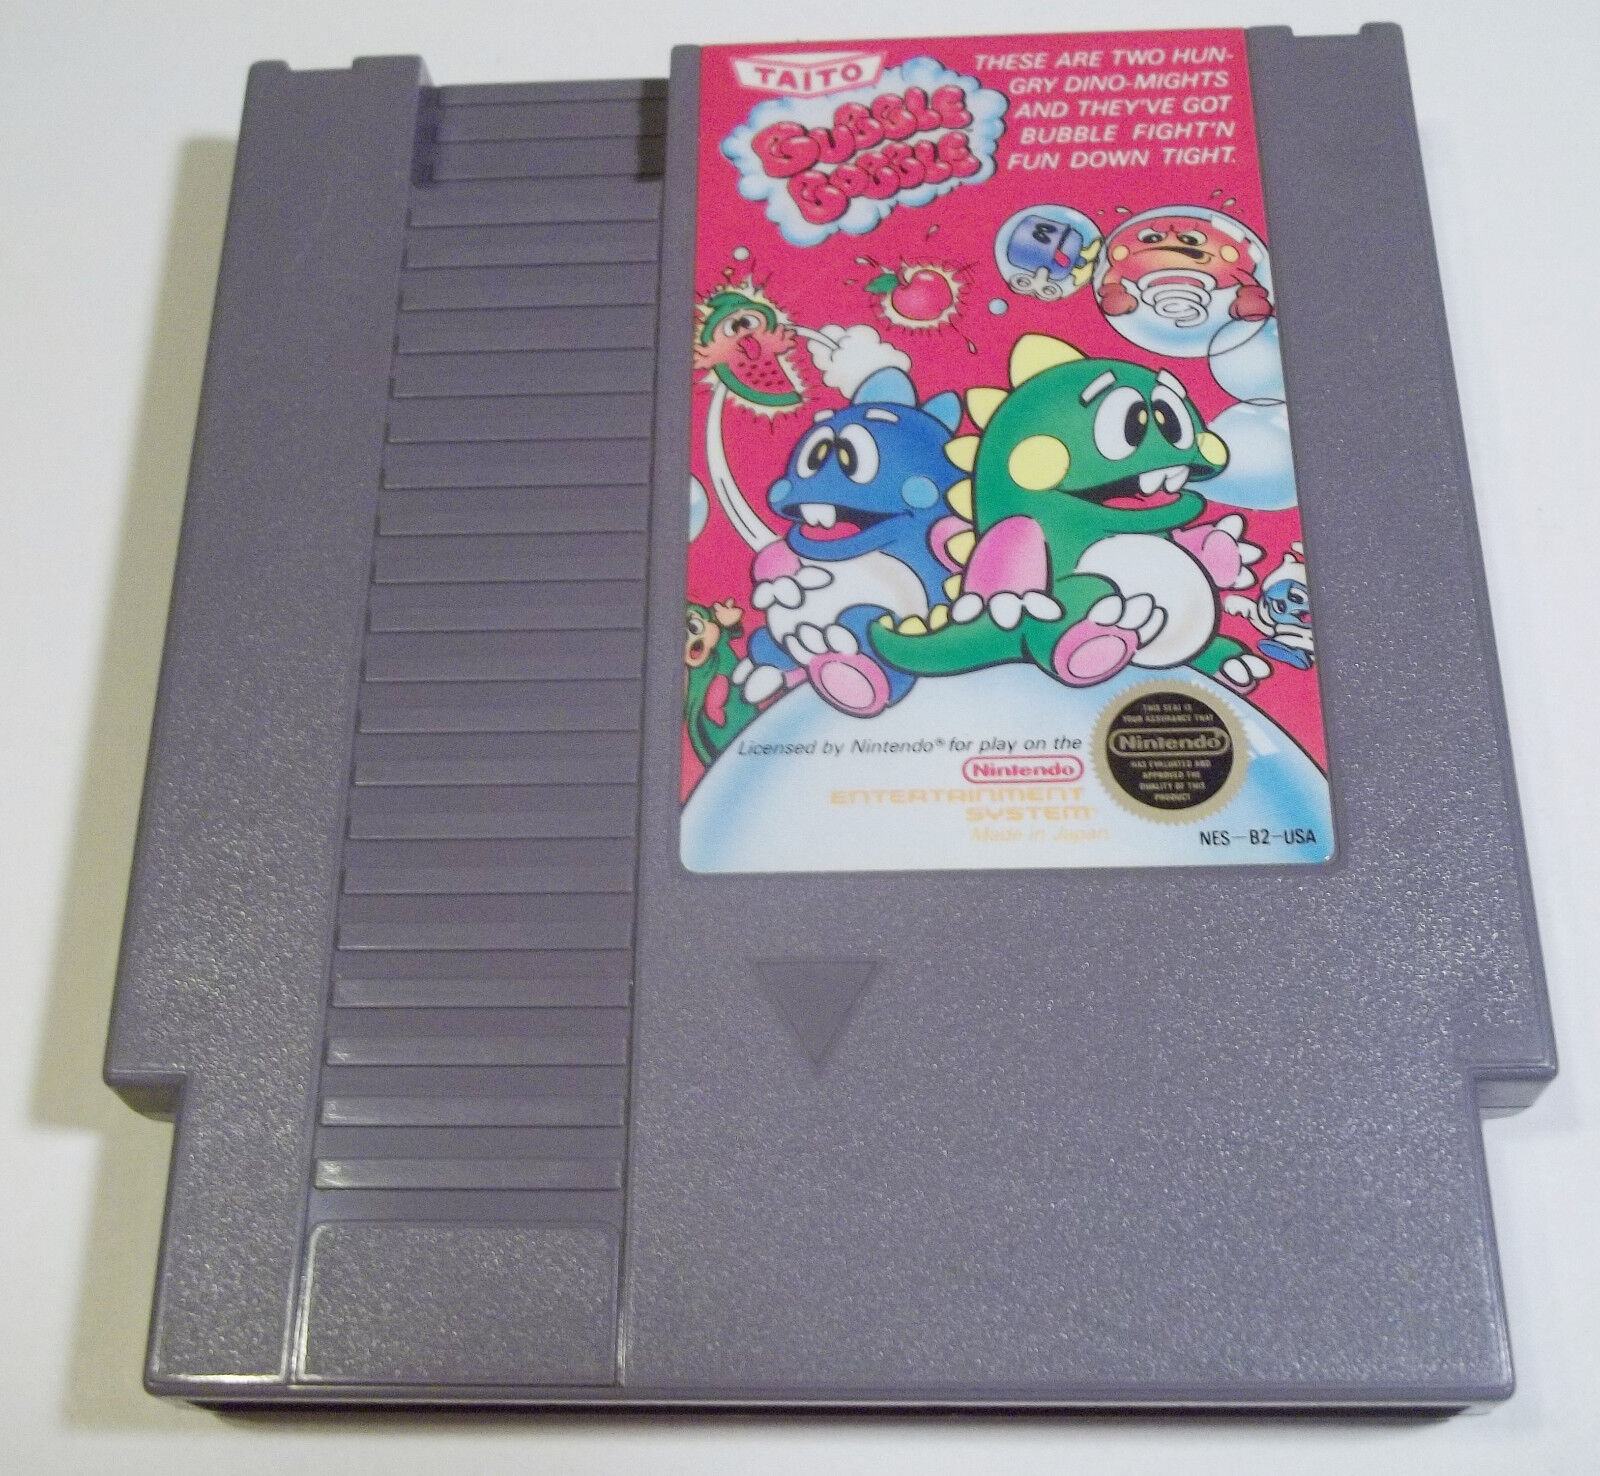 Bubble Bobble Nintendo 1988 Good Condition Taito NES Action Video Game - $25.47